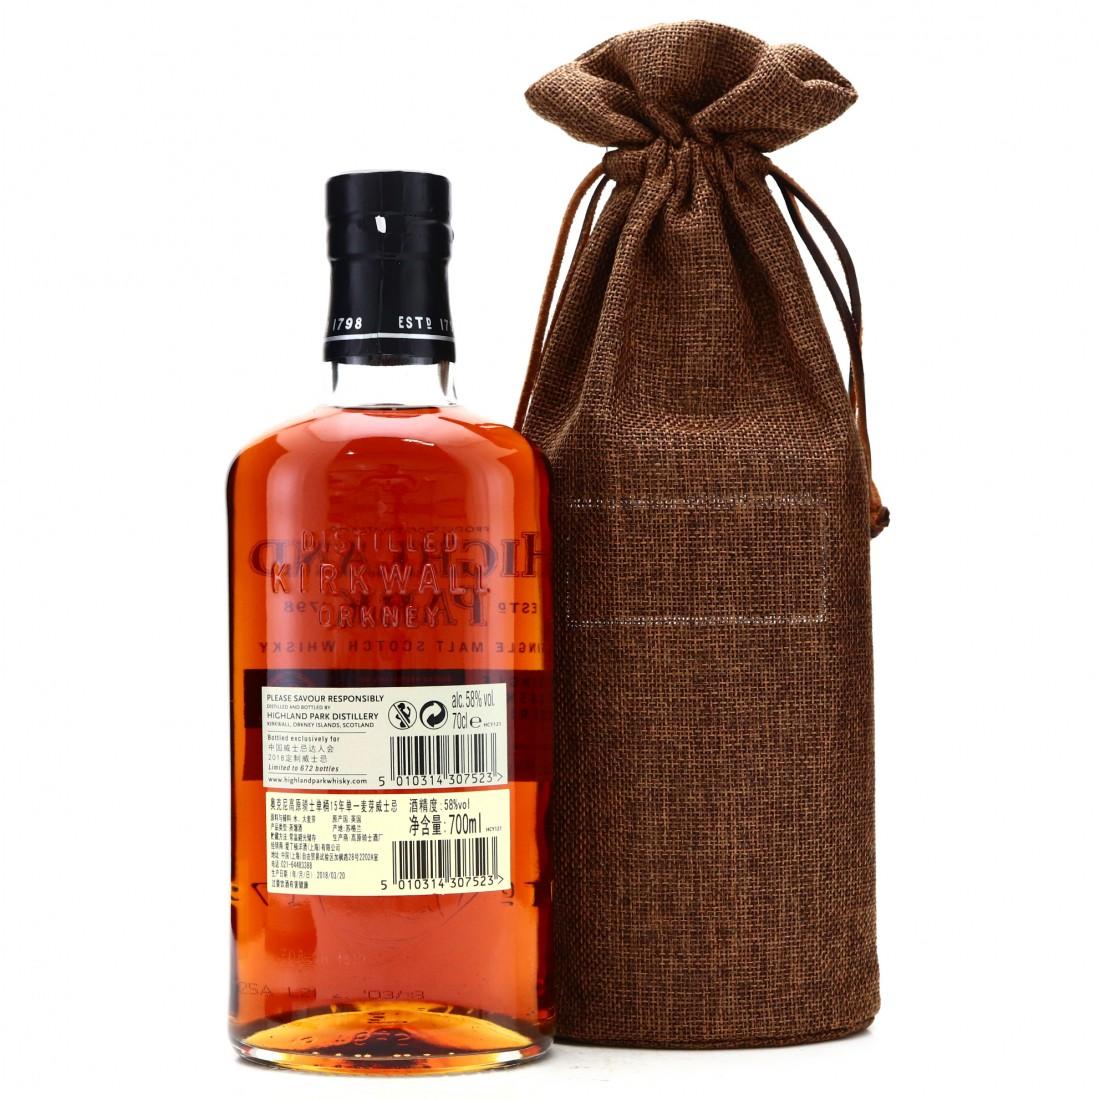 Highland Park 2003 Single Cask 15 Year Old #1305 / China Whisky Association